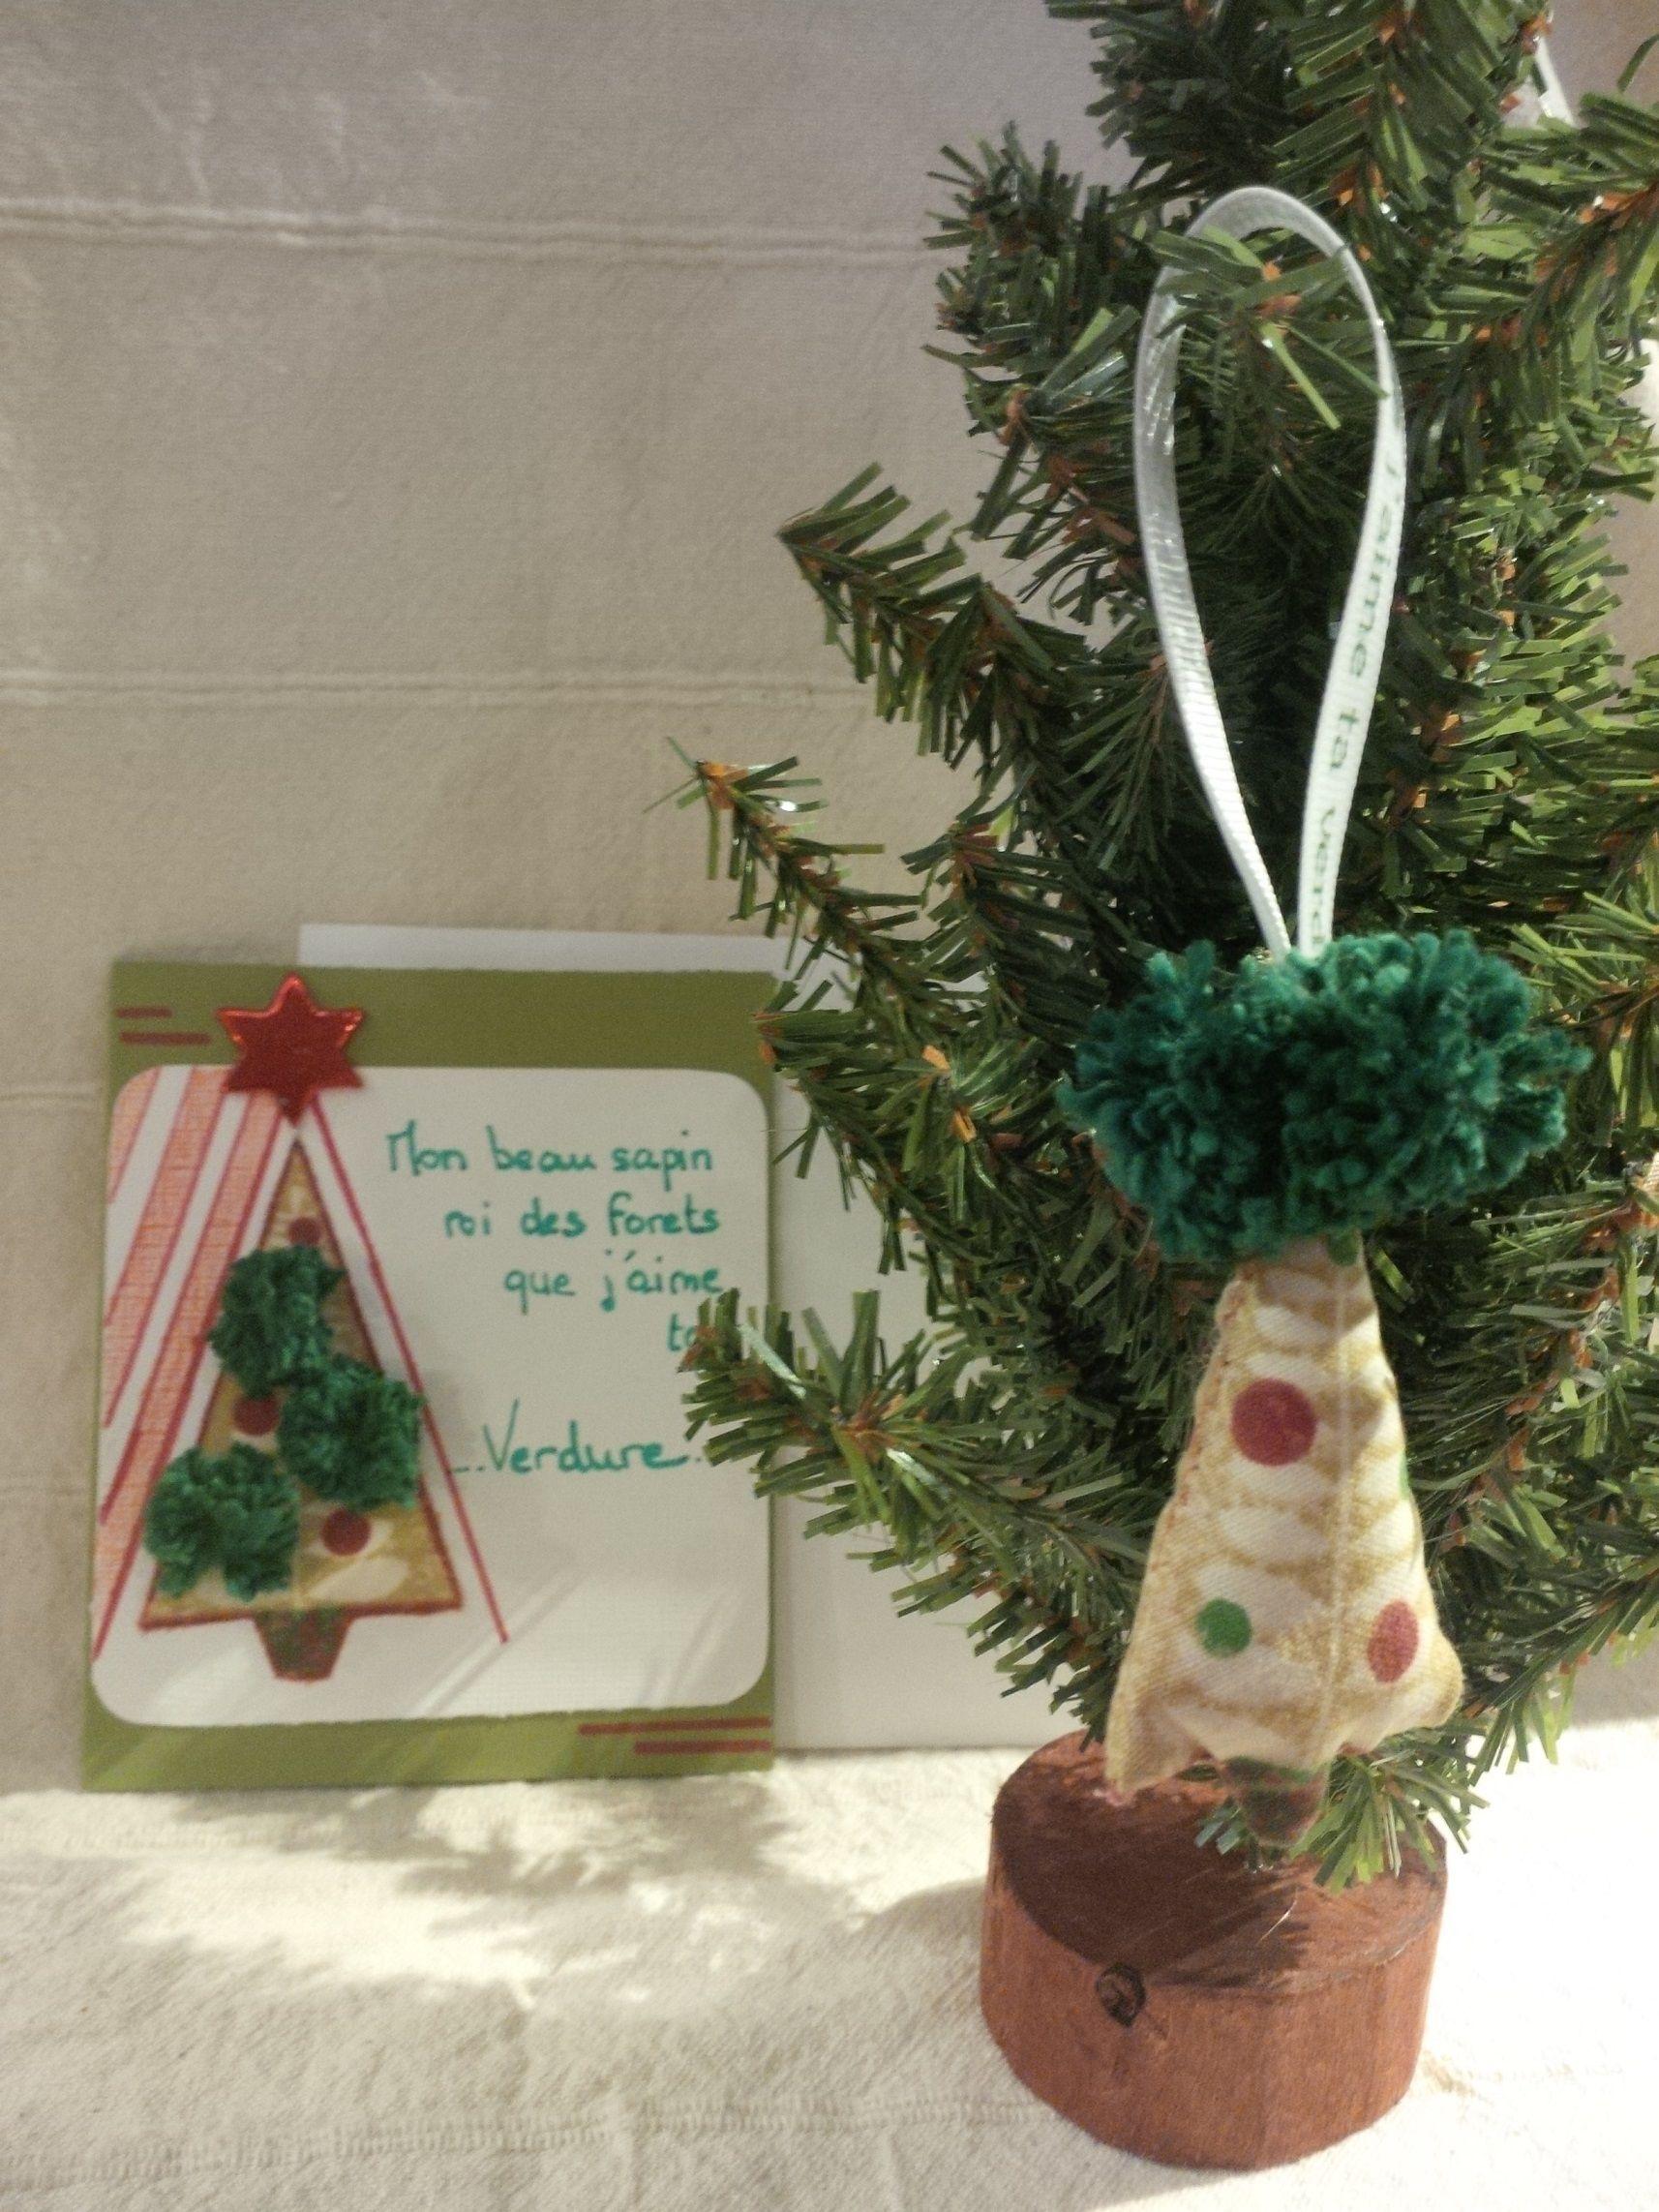 card and Christmas tree ornament \'Mon beau sapin\